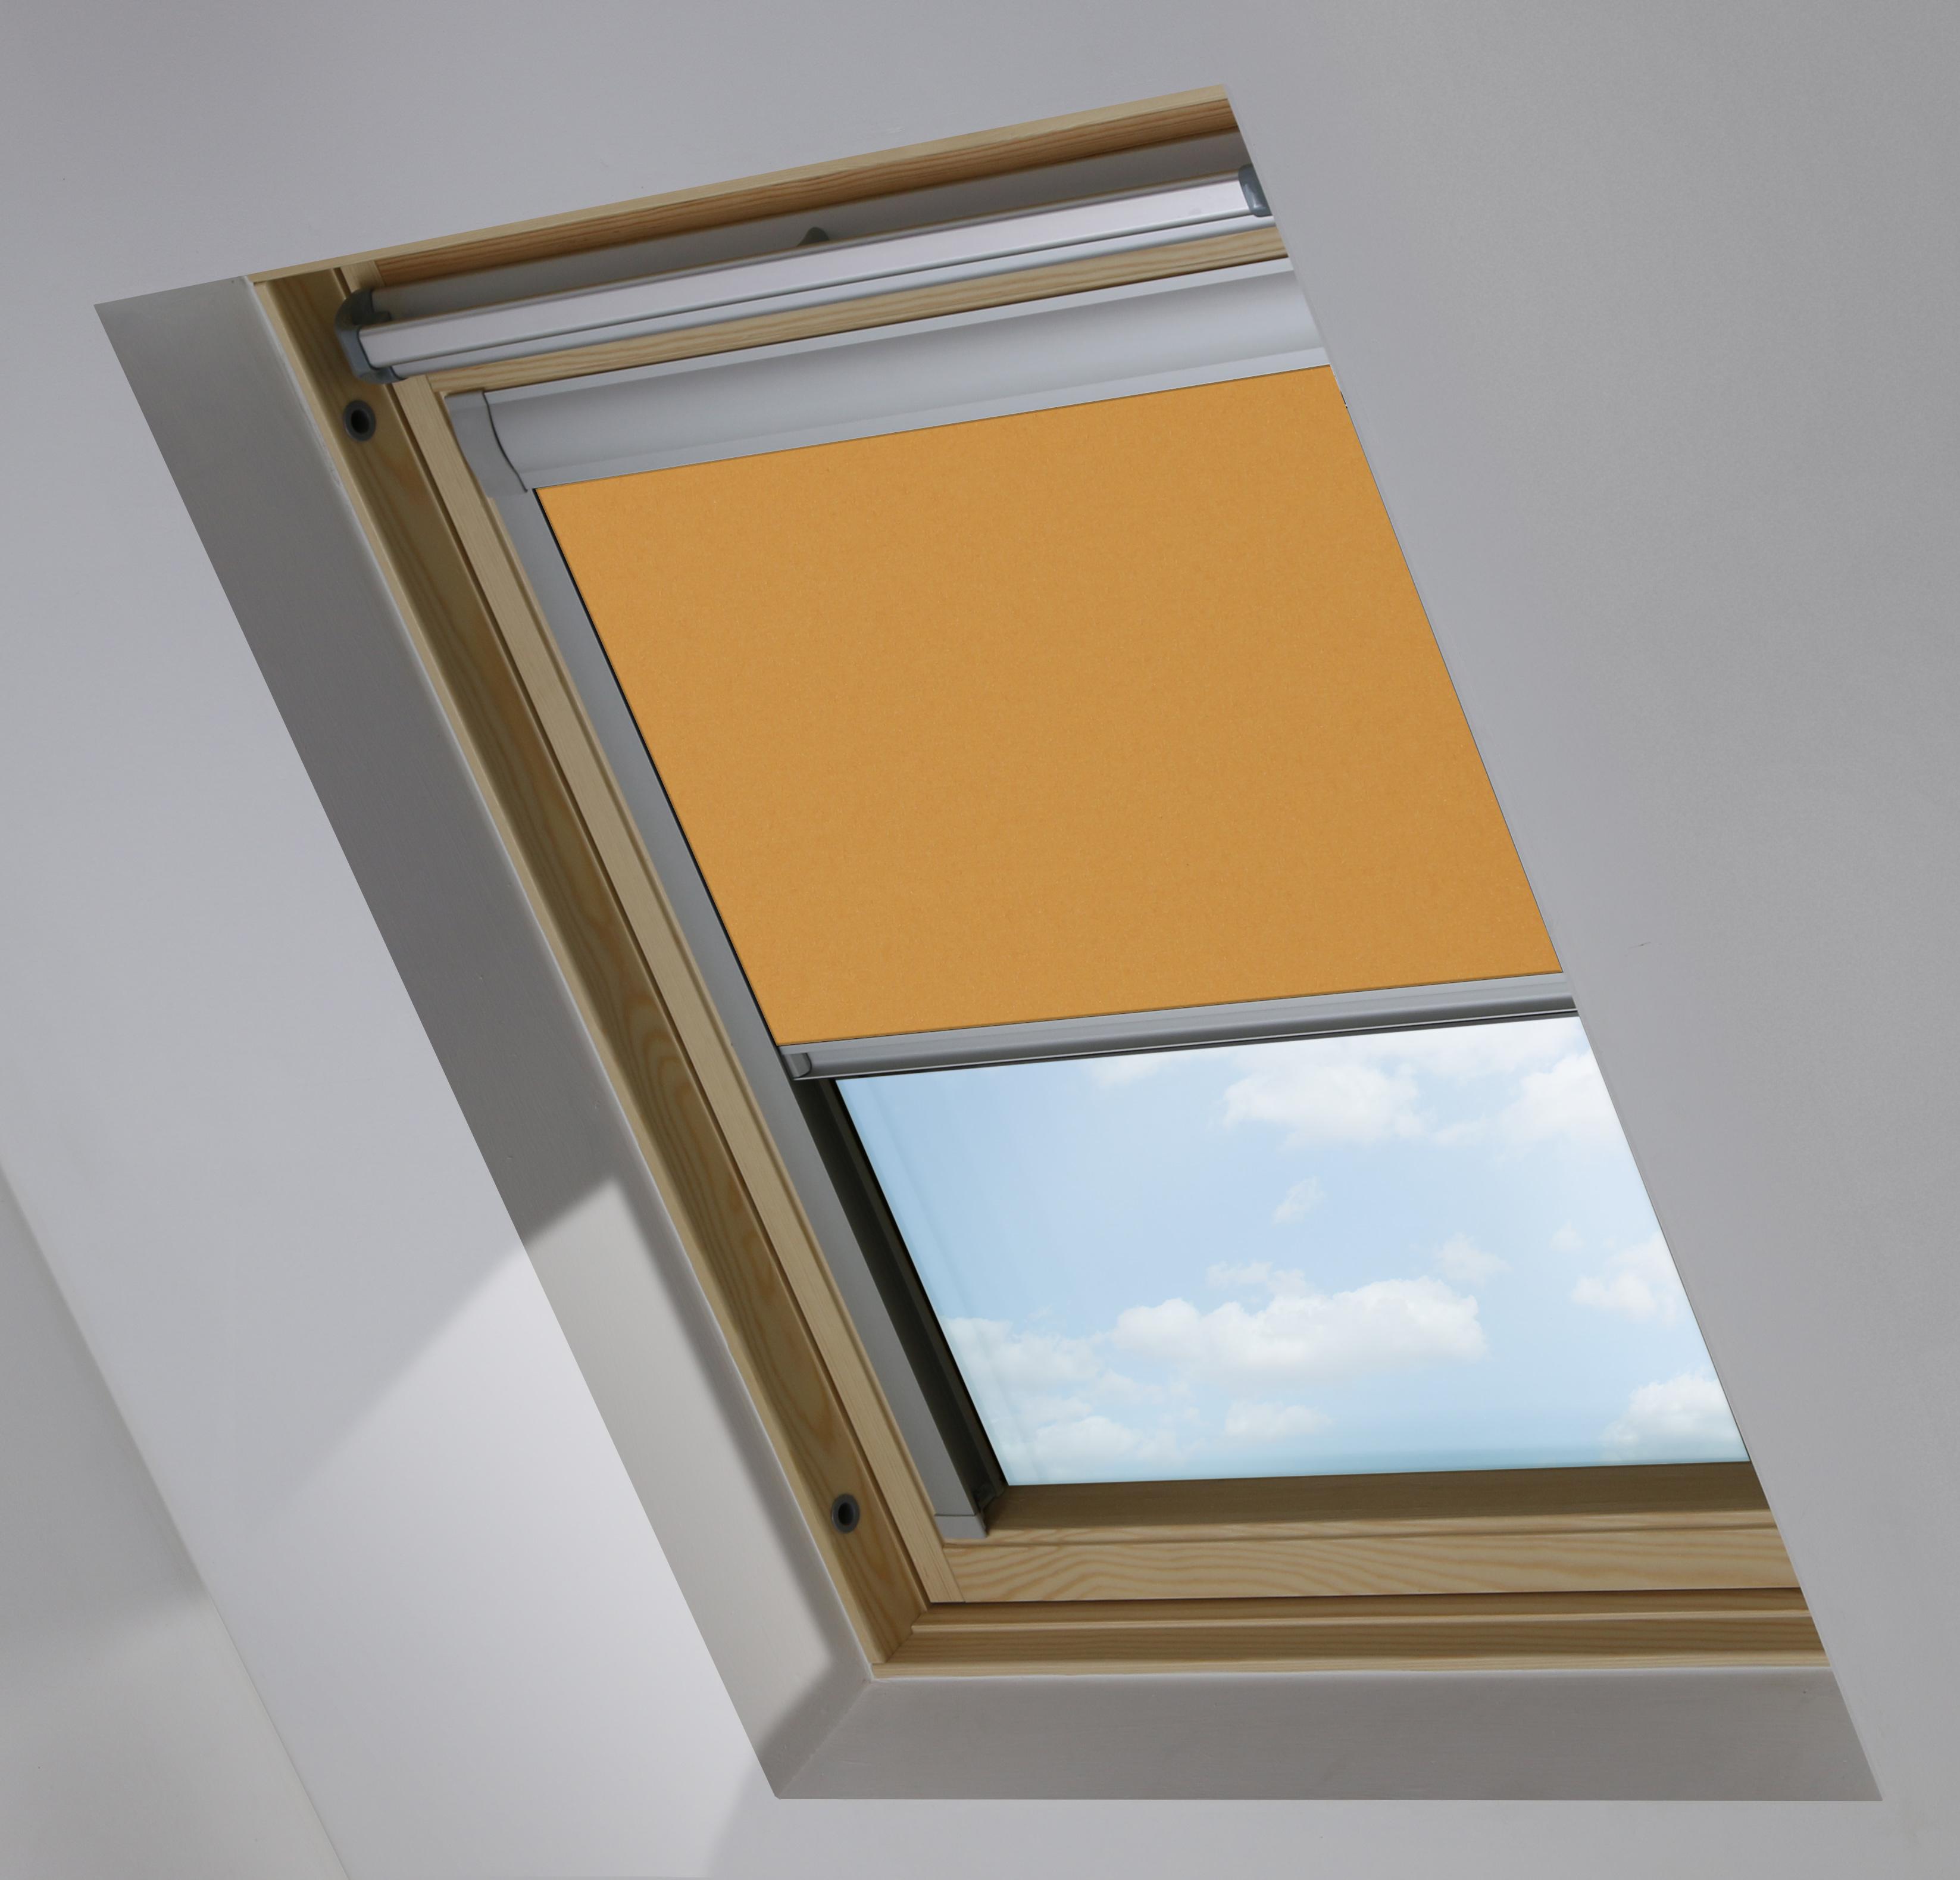 0424 Amber Sunset fabric - a bright orange fabric